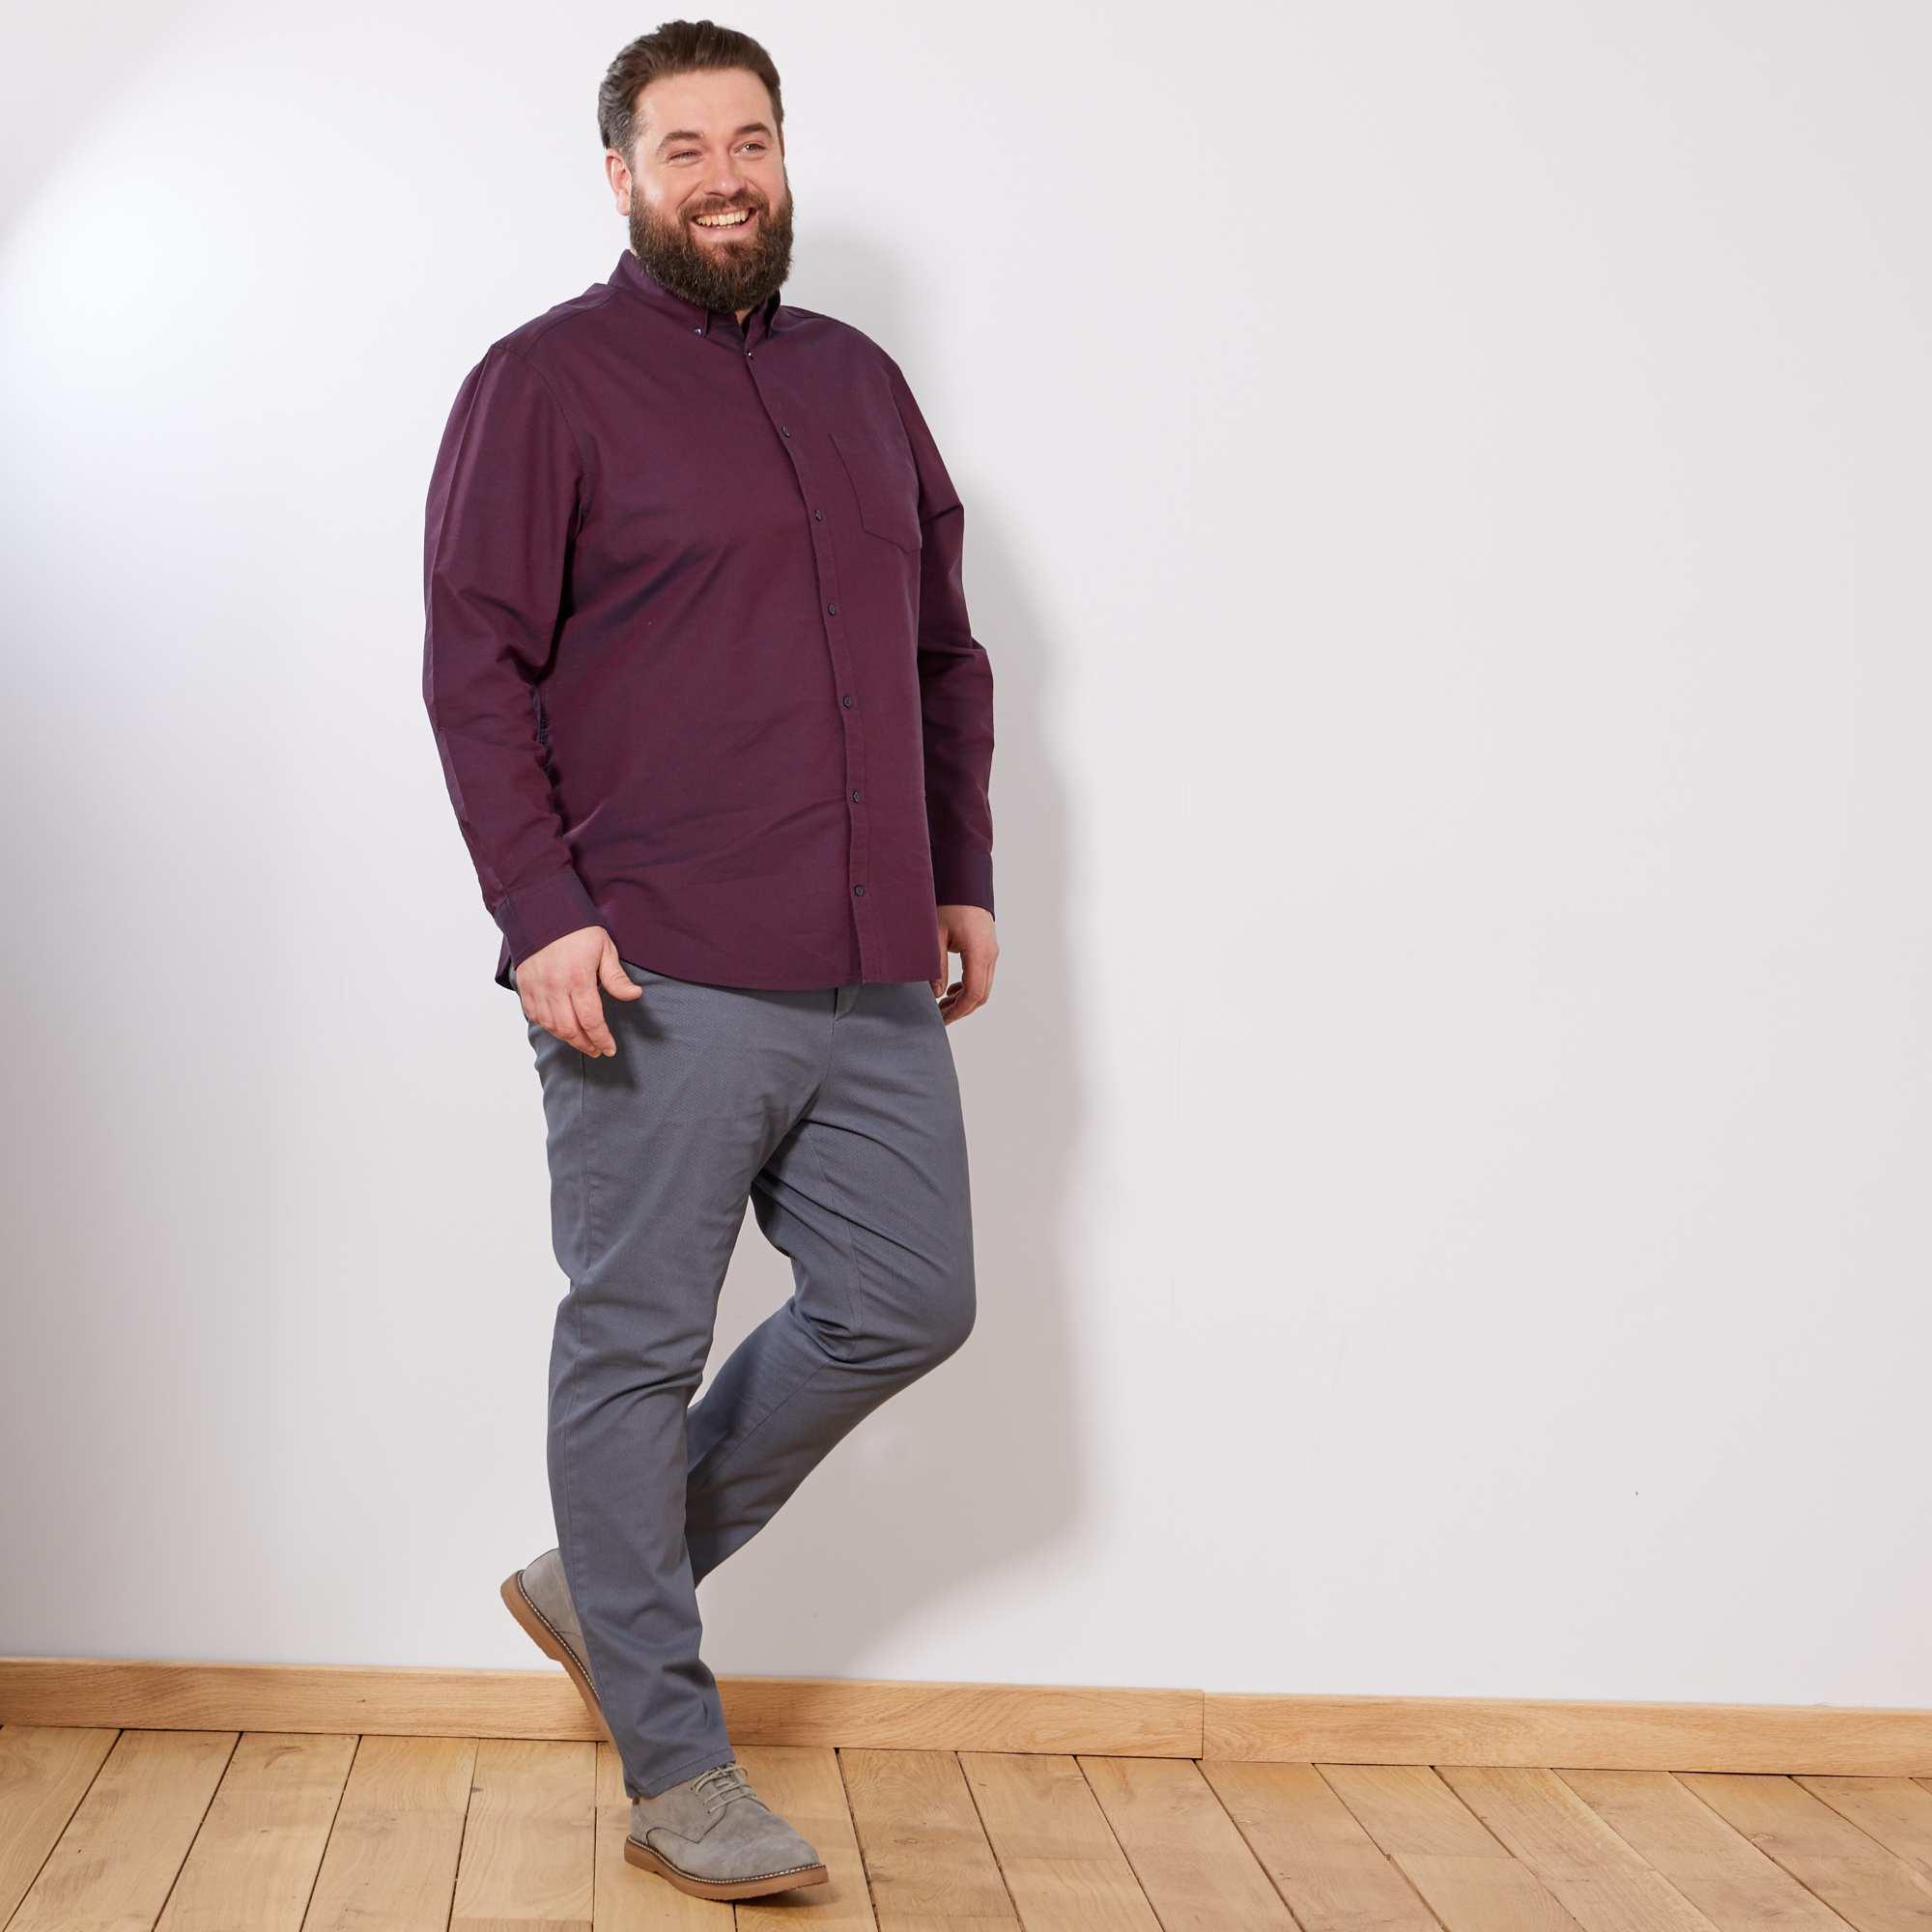 pantalon fitted micro motif grande taille homme gris. Black Bedroom Furniture Sets. Home Design Ideas